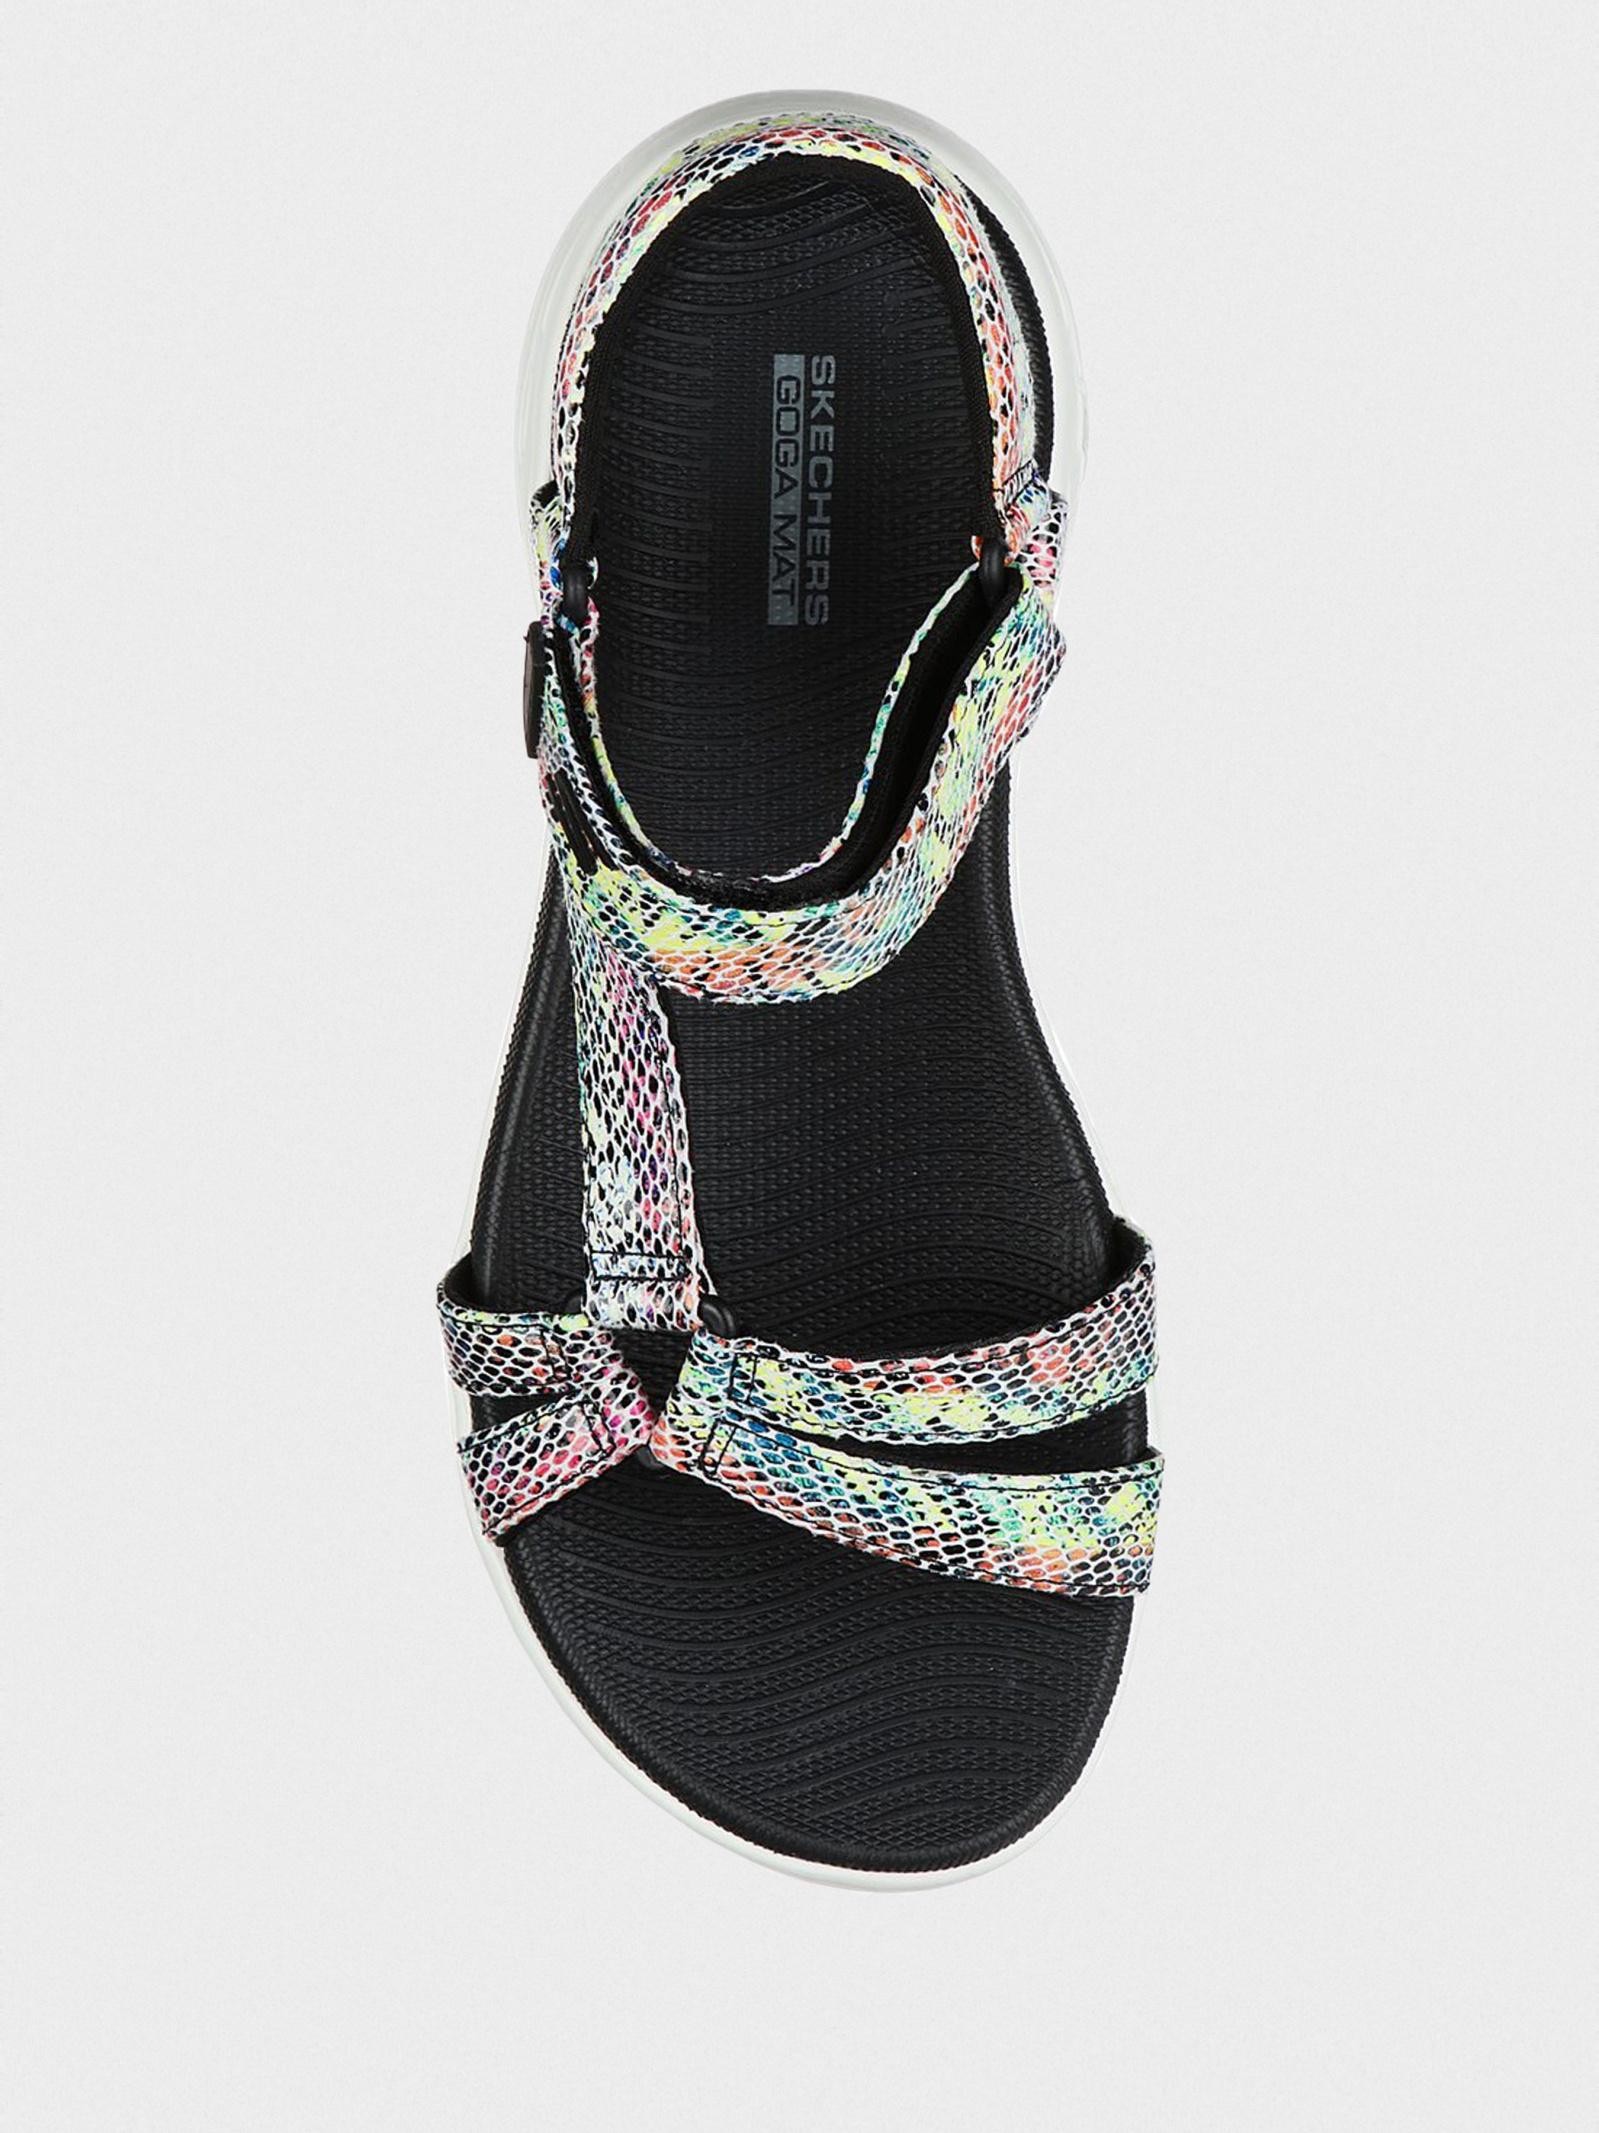 Сандалии женские Skechers On-The-Go KW5585 Заказать, 2017